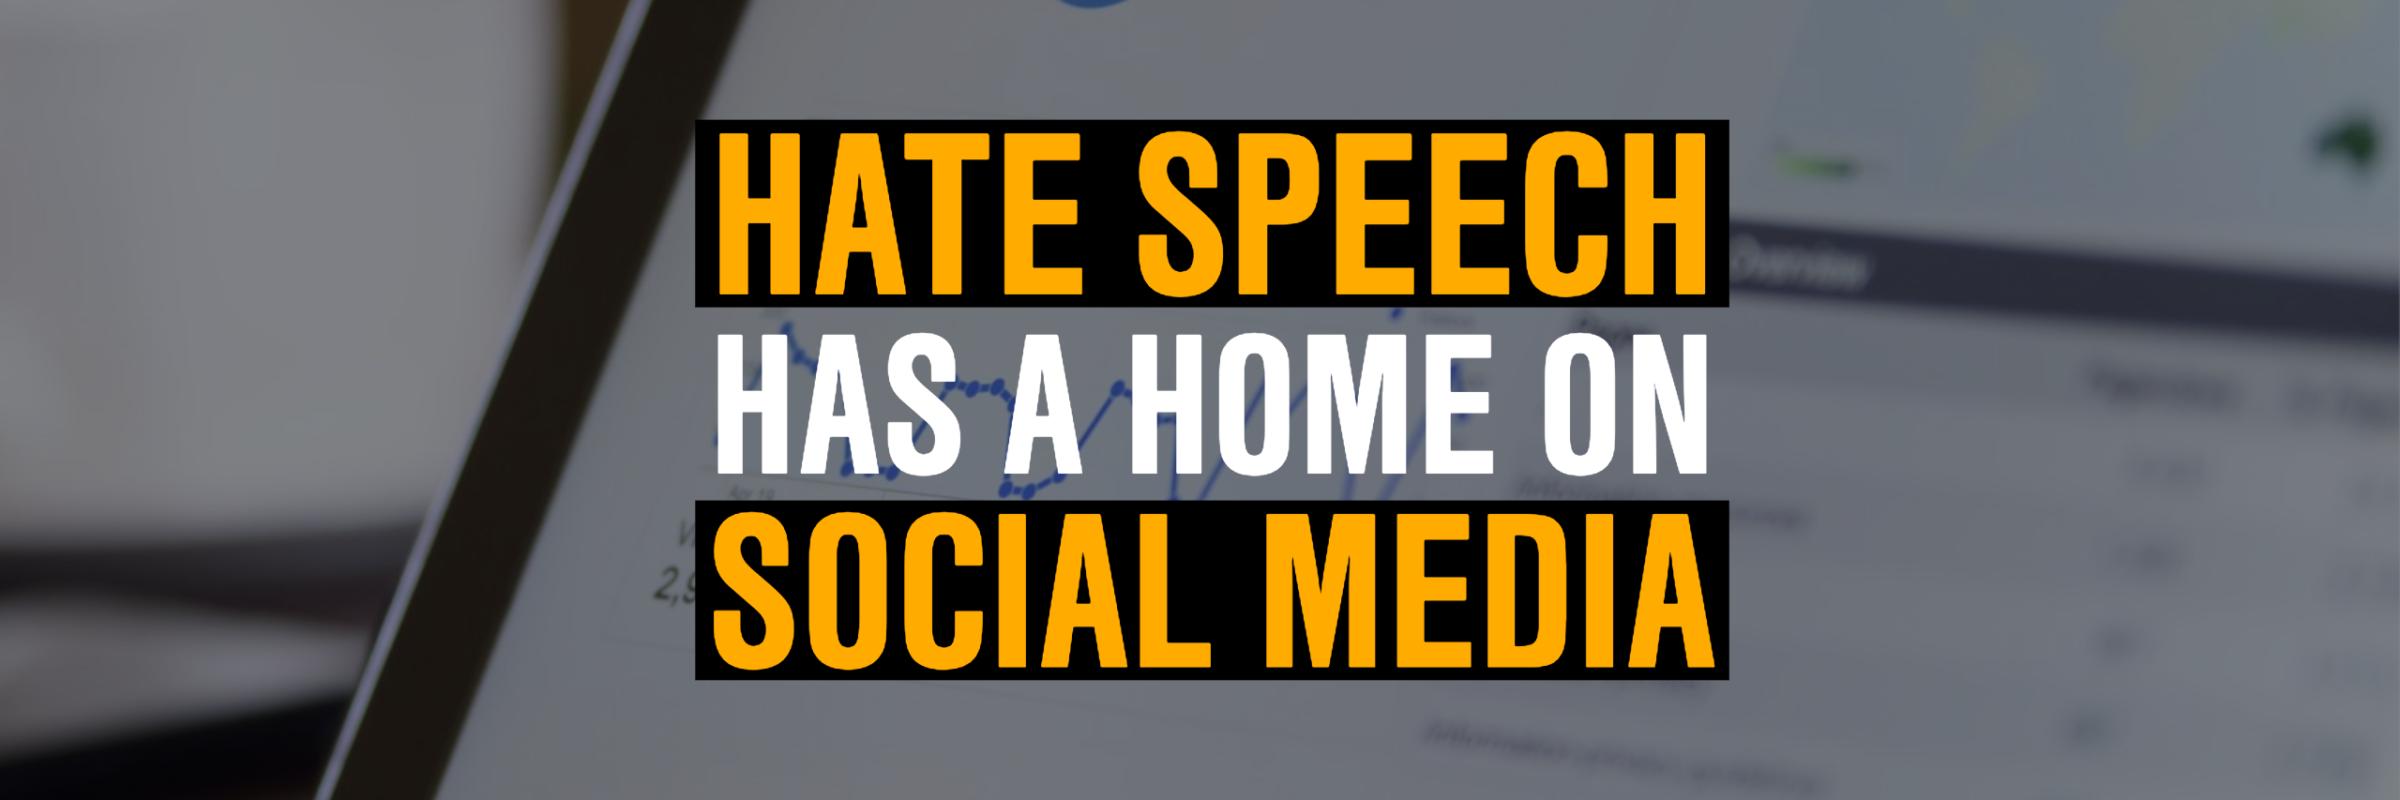 hate speech has a home on social media